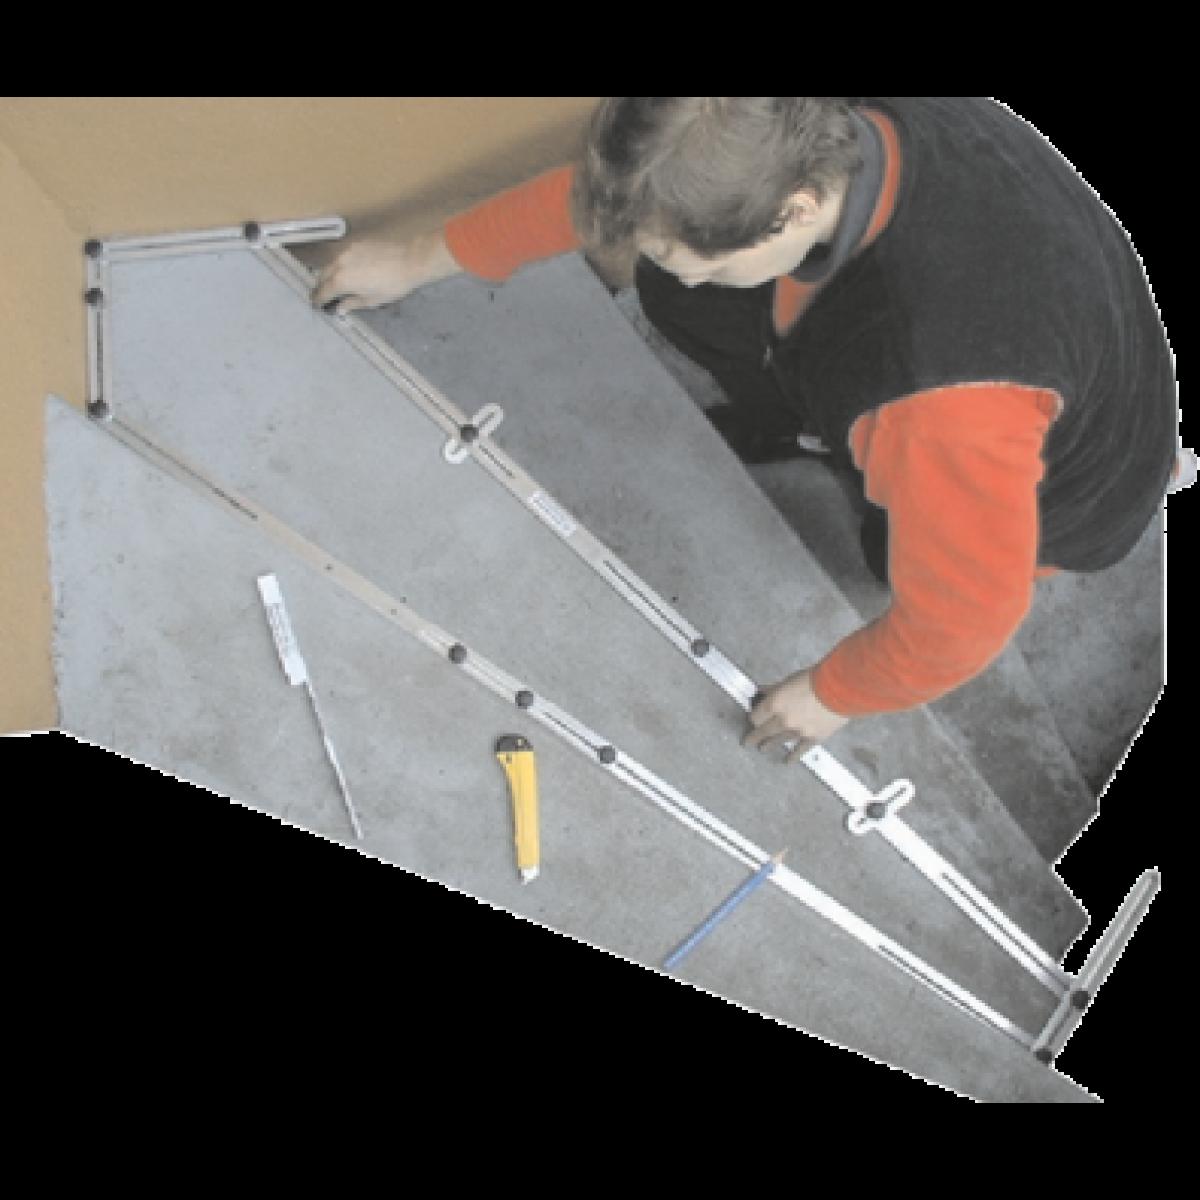 Treppen-Winkelschablone - mit Holzkoffer -